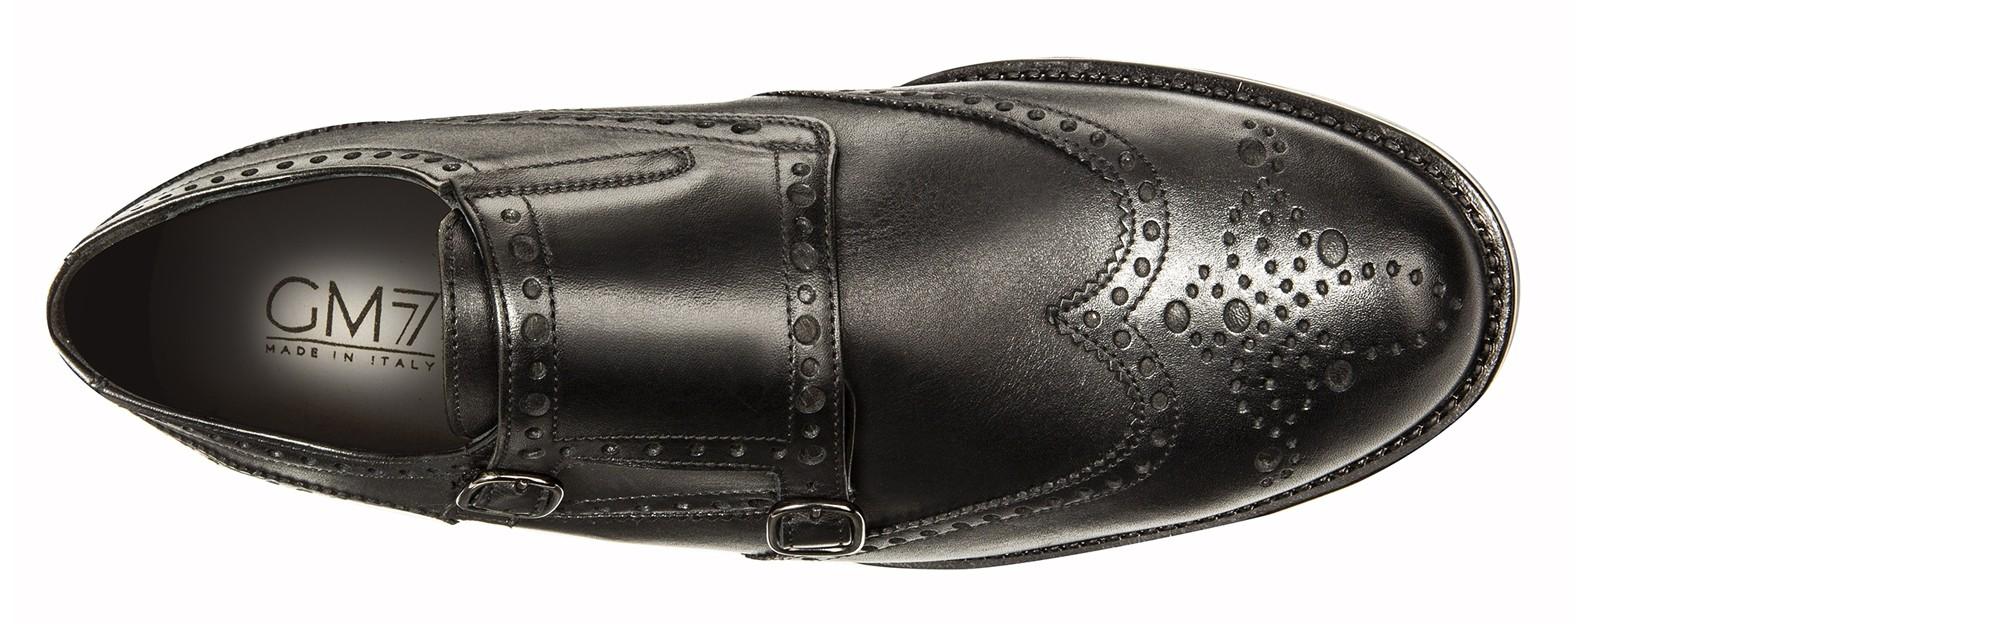 Gianni elevator shoes